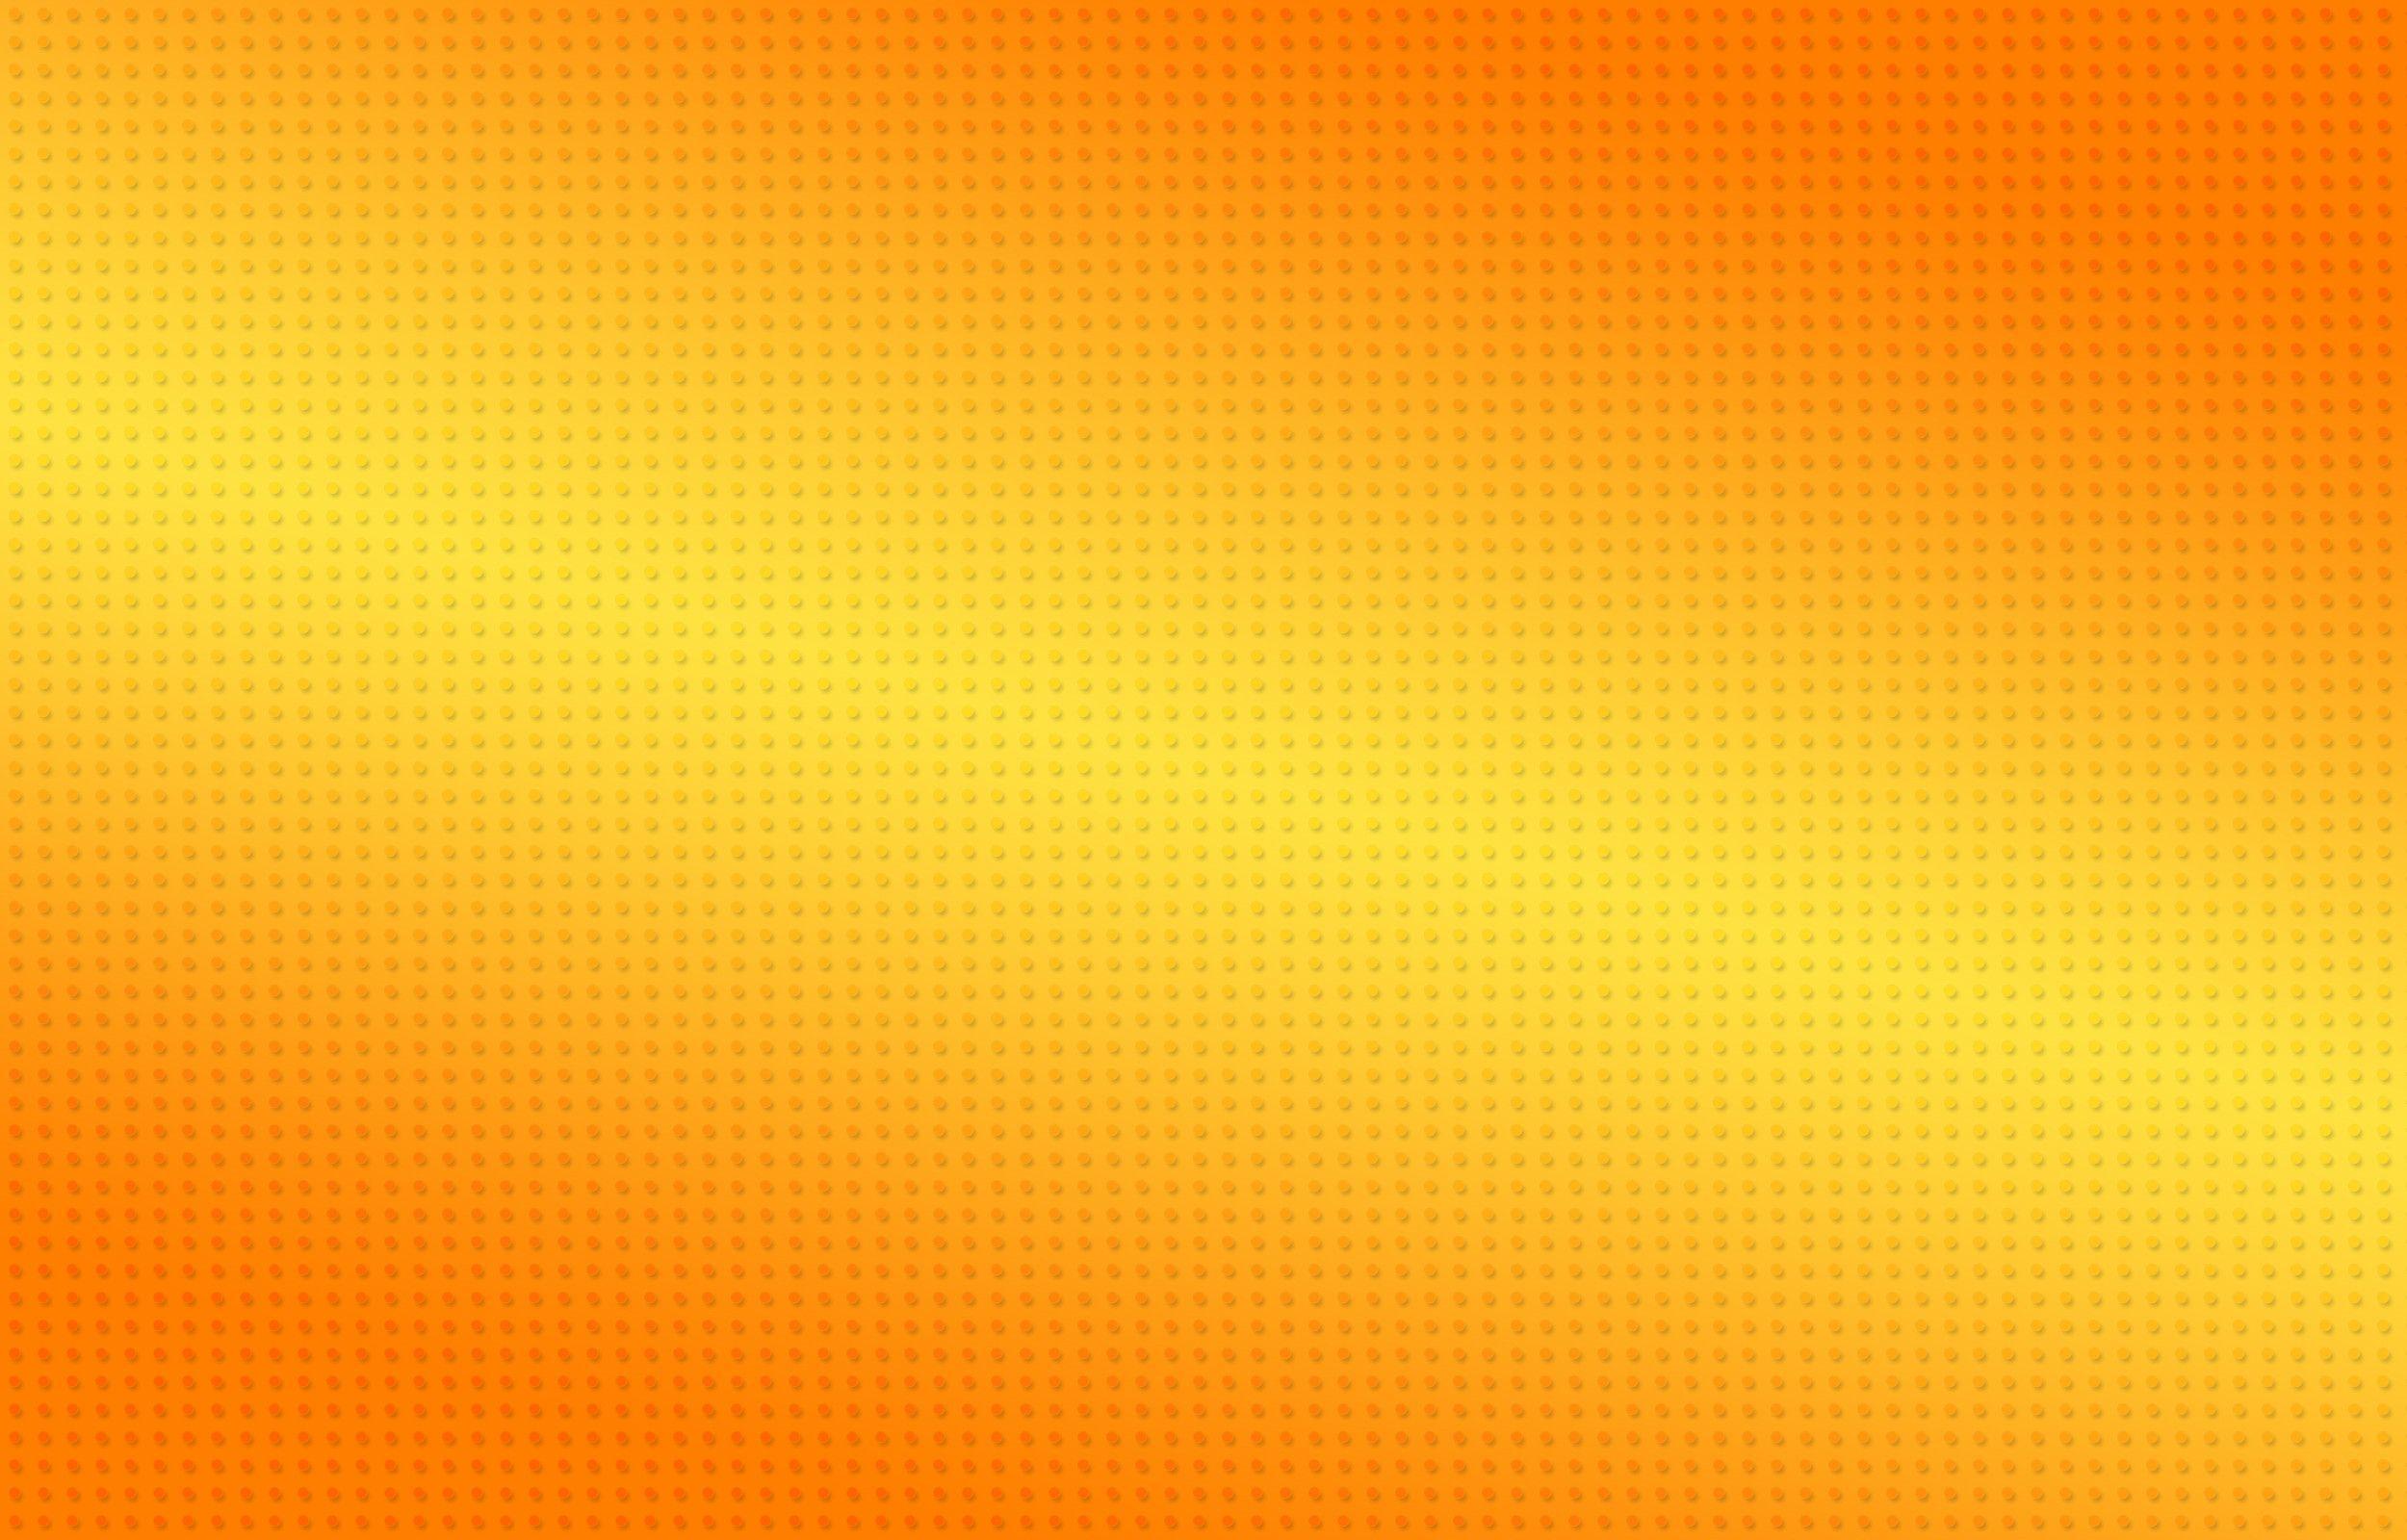 orange wallpaper06 - photo #41